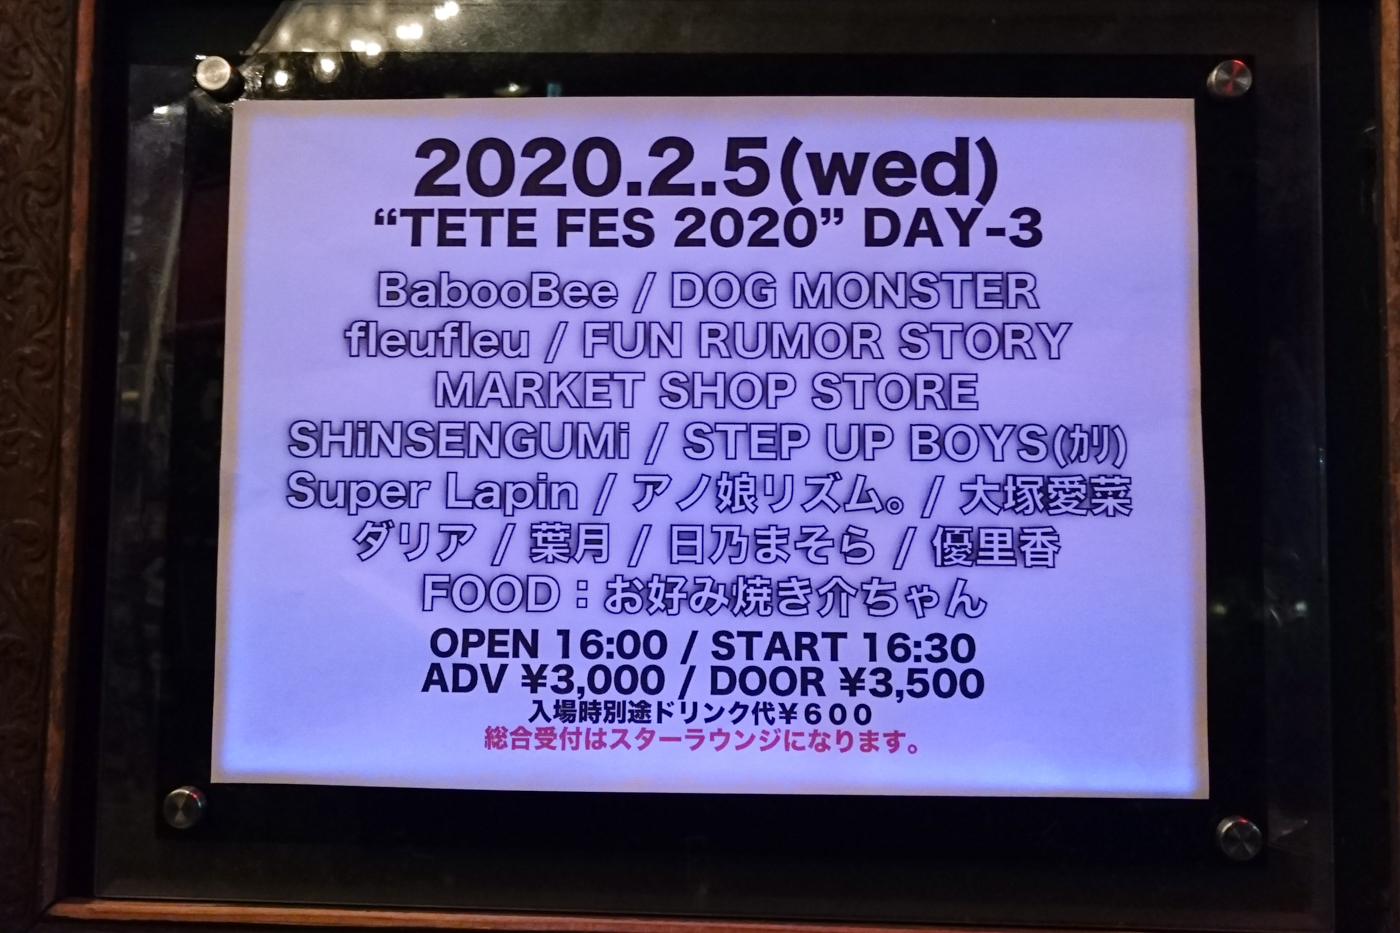 「TETE FES 2020(DAY-3)@スターラウンジ・チェルシーホテル2会場サーキットイベント